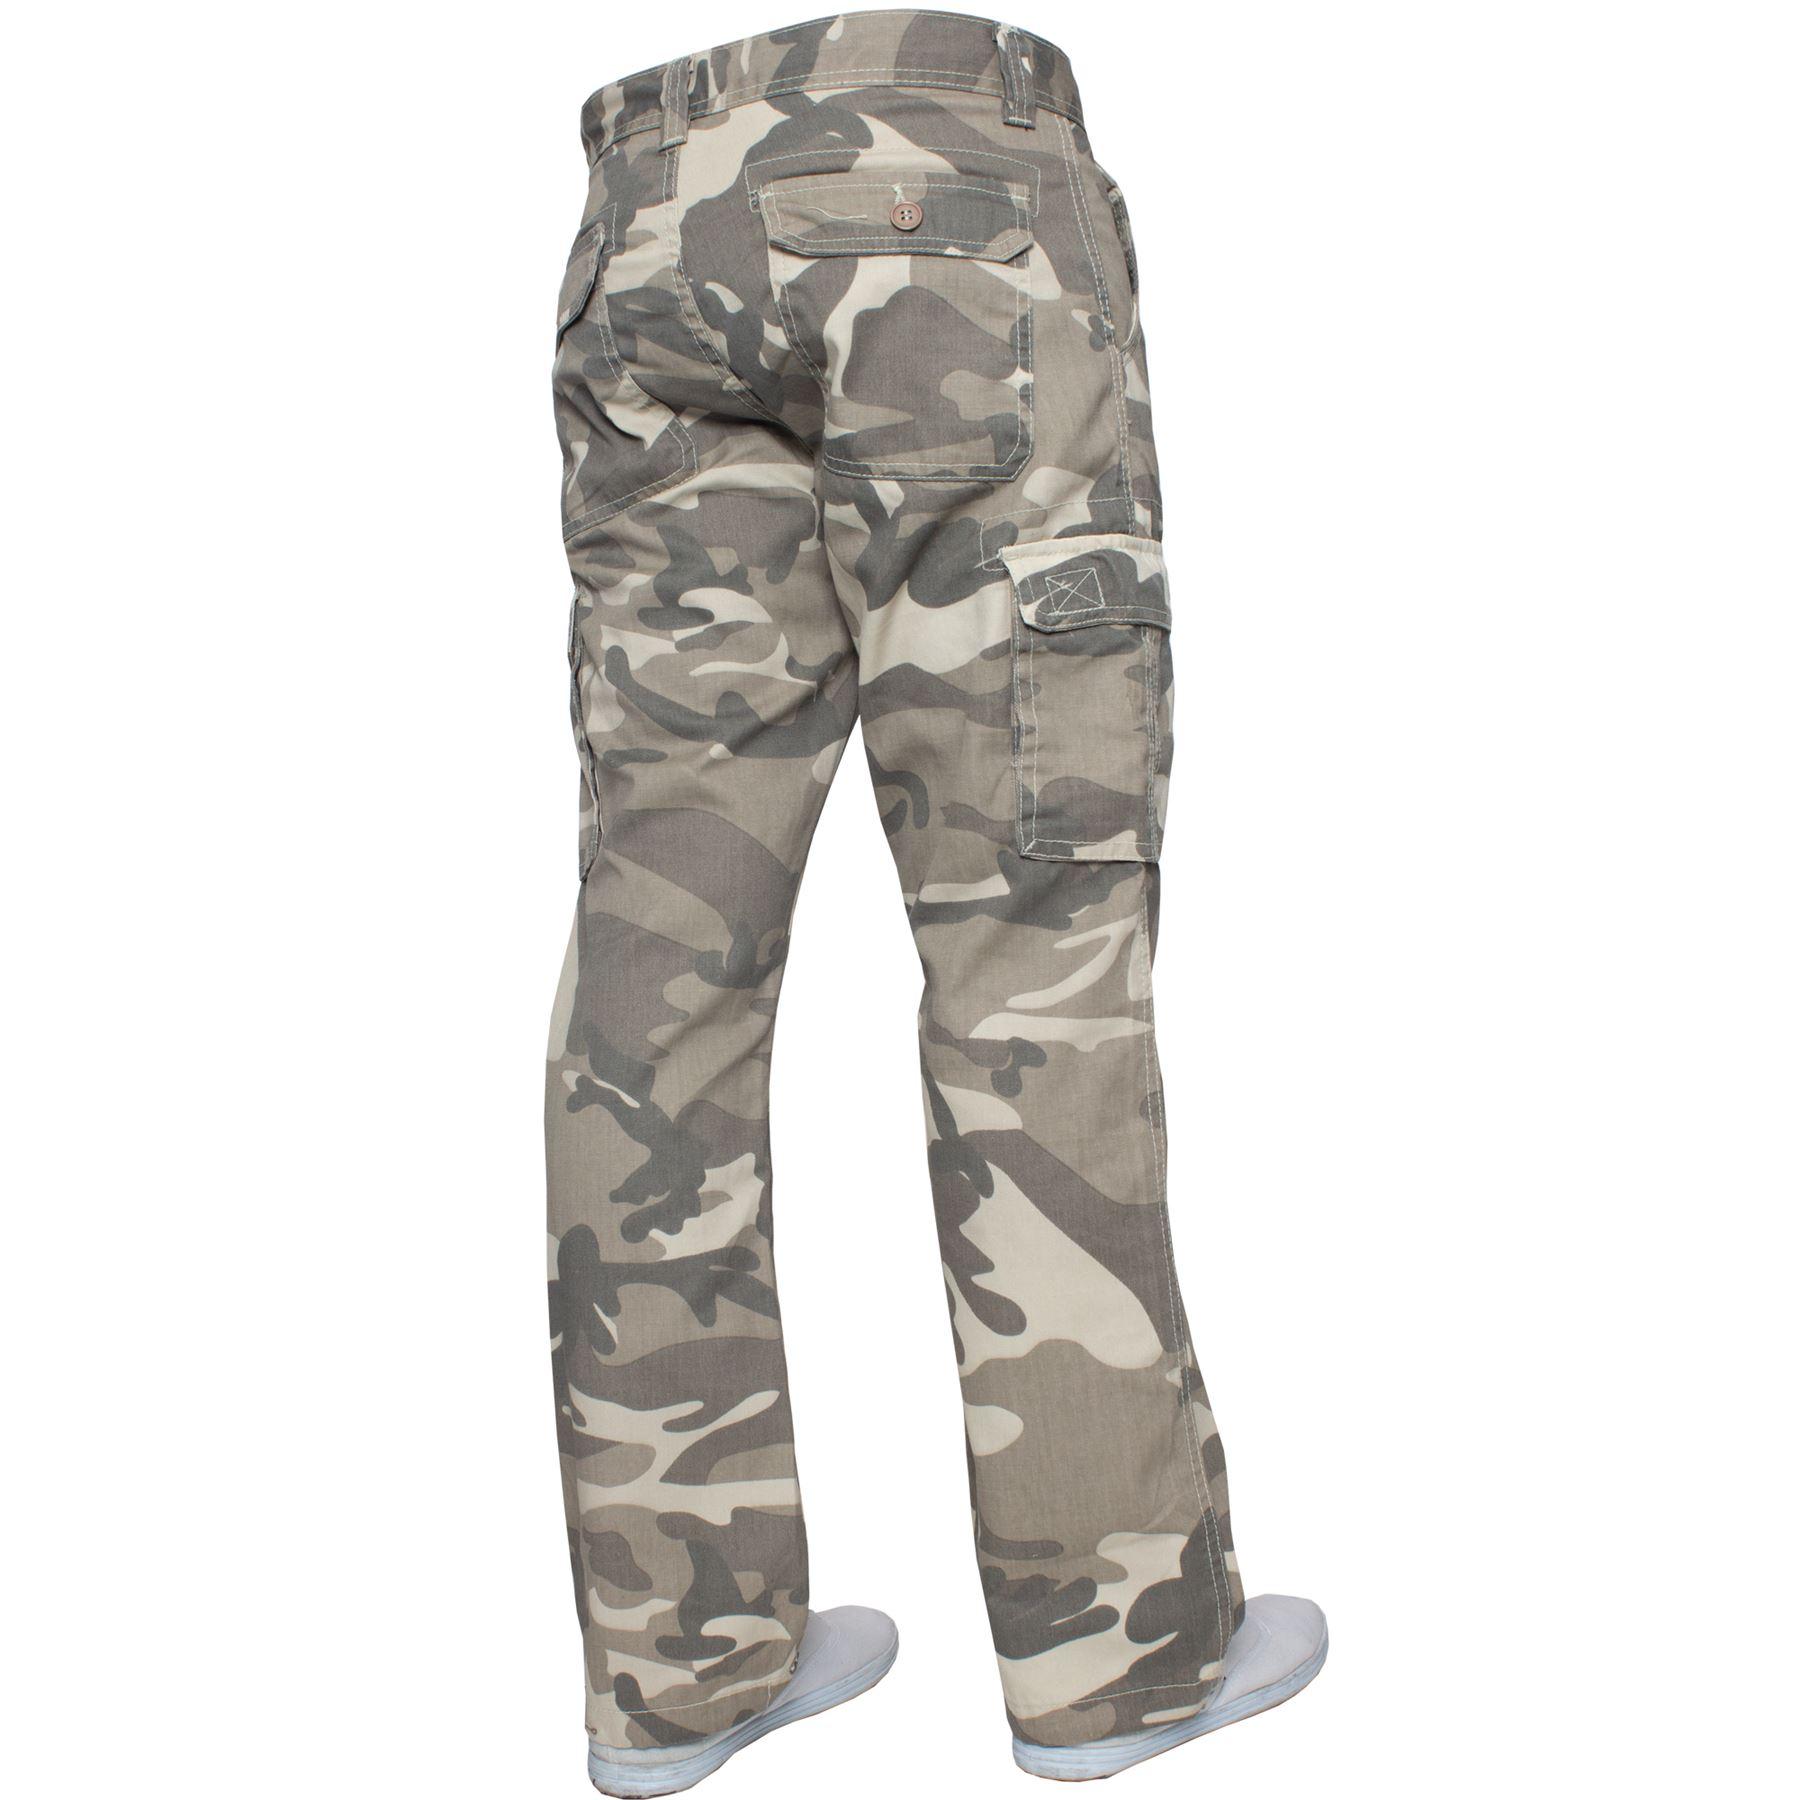 Kruze para Hombre Militar Pantalón Camuflaje Cargo Casual Trabajo Pantalones